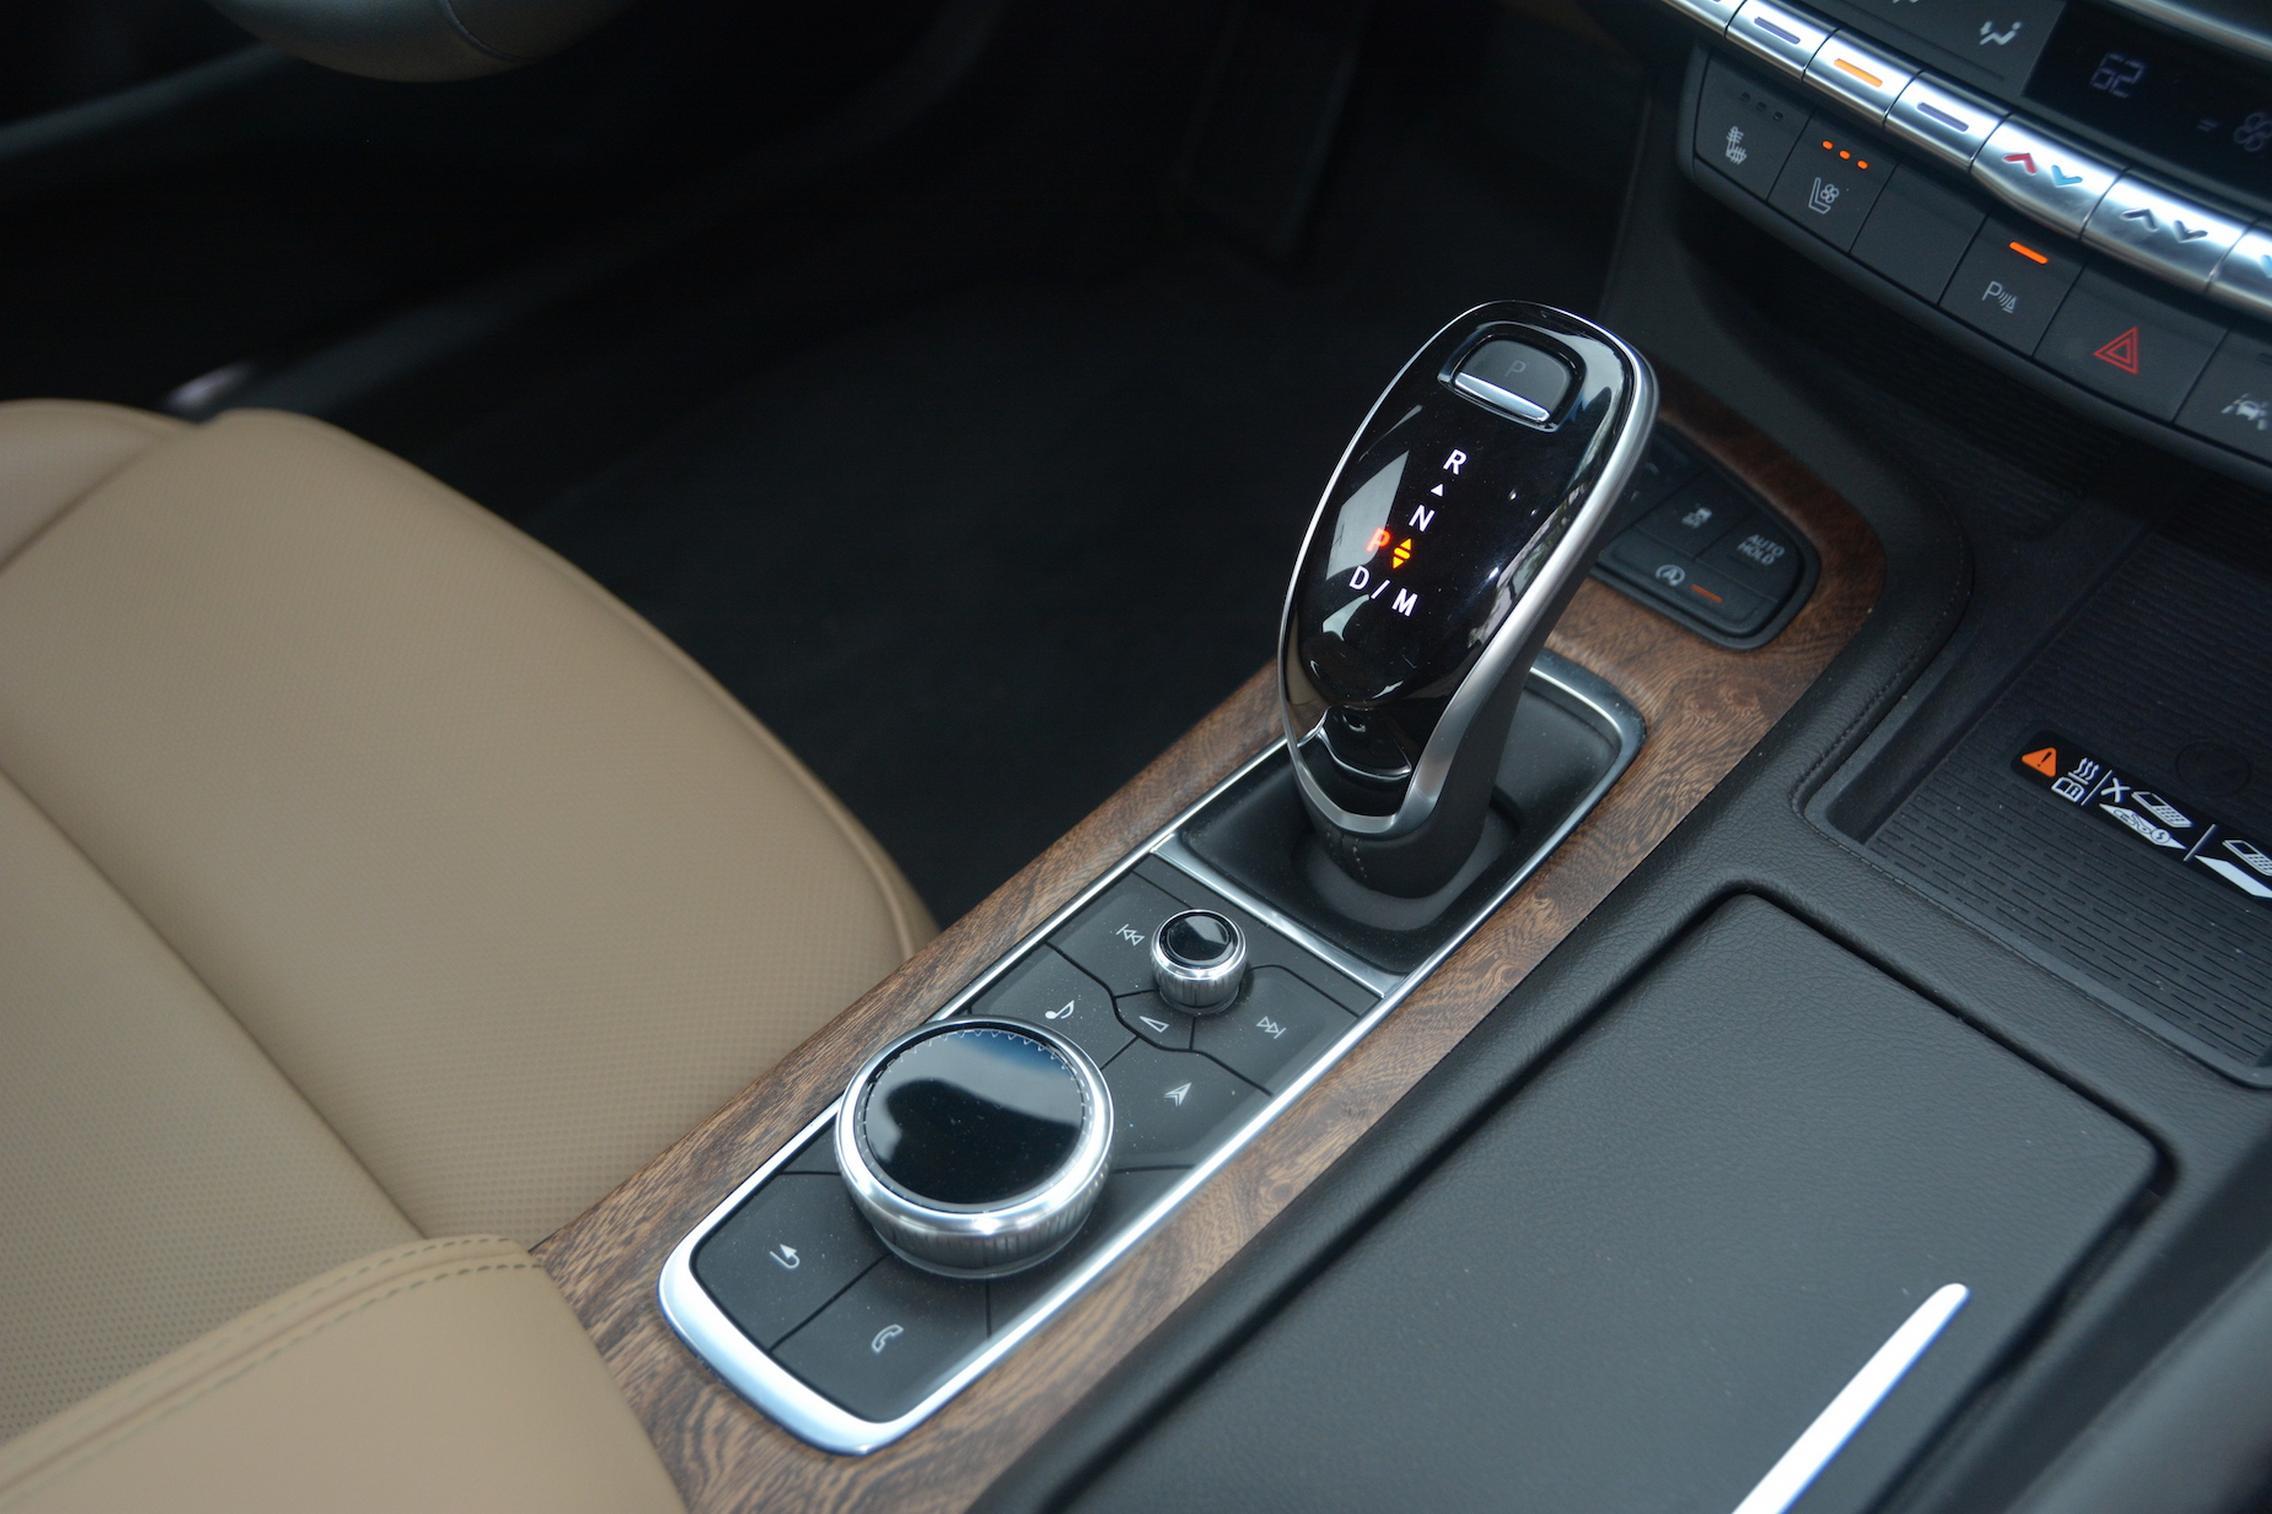 2021 Cadillac CT5 center console